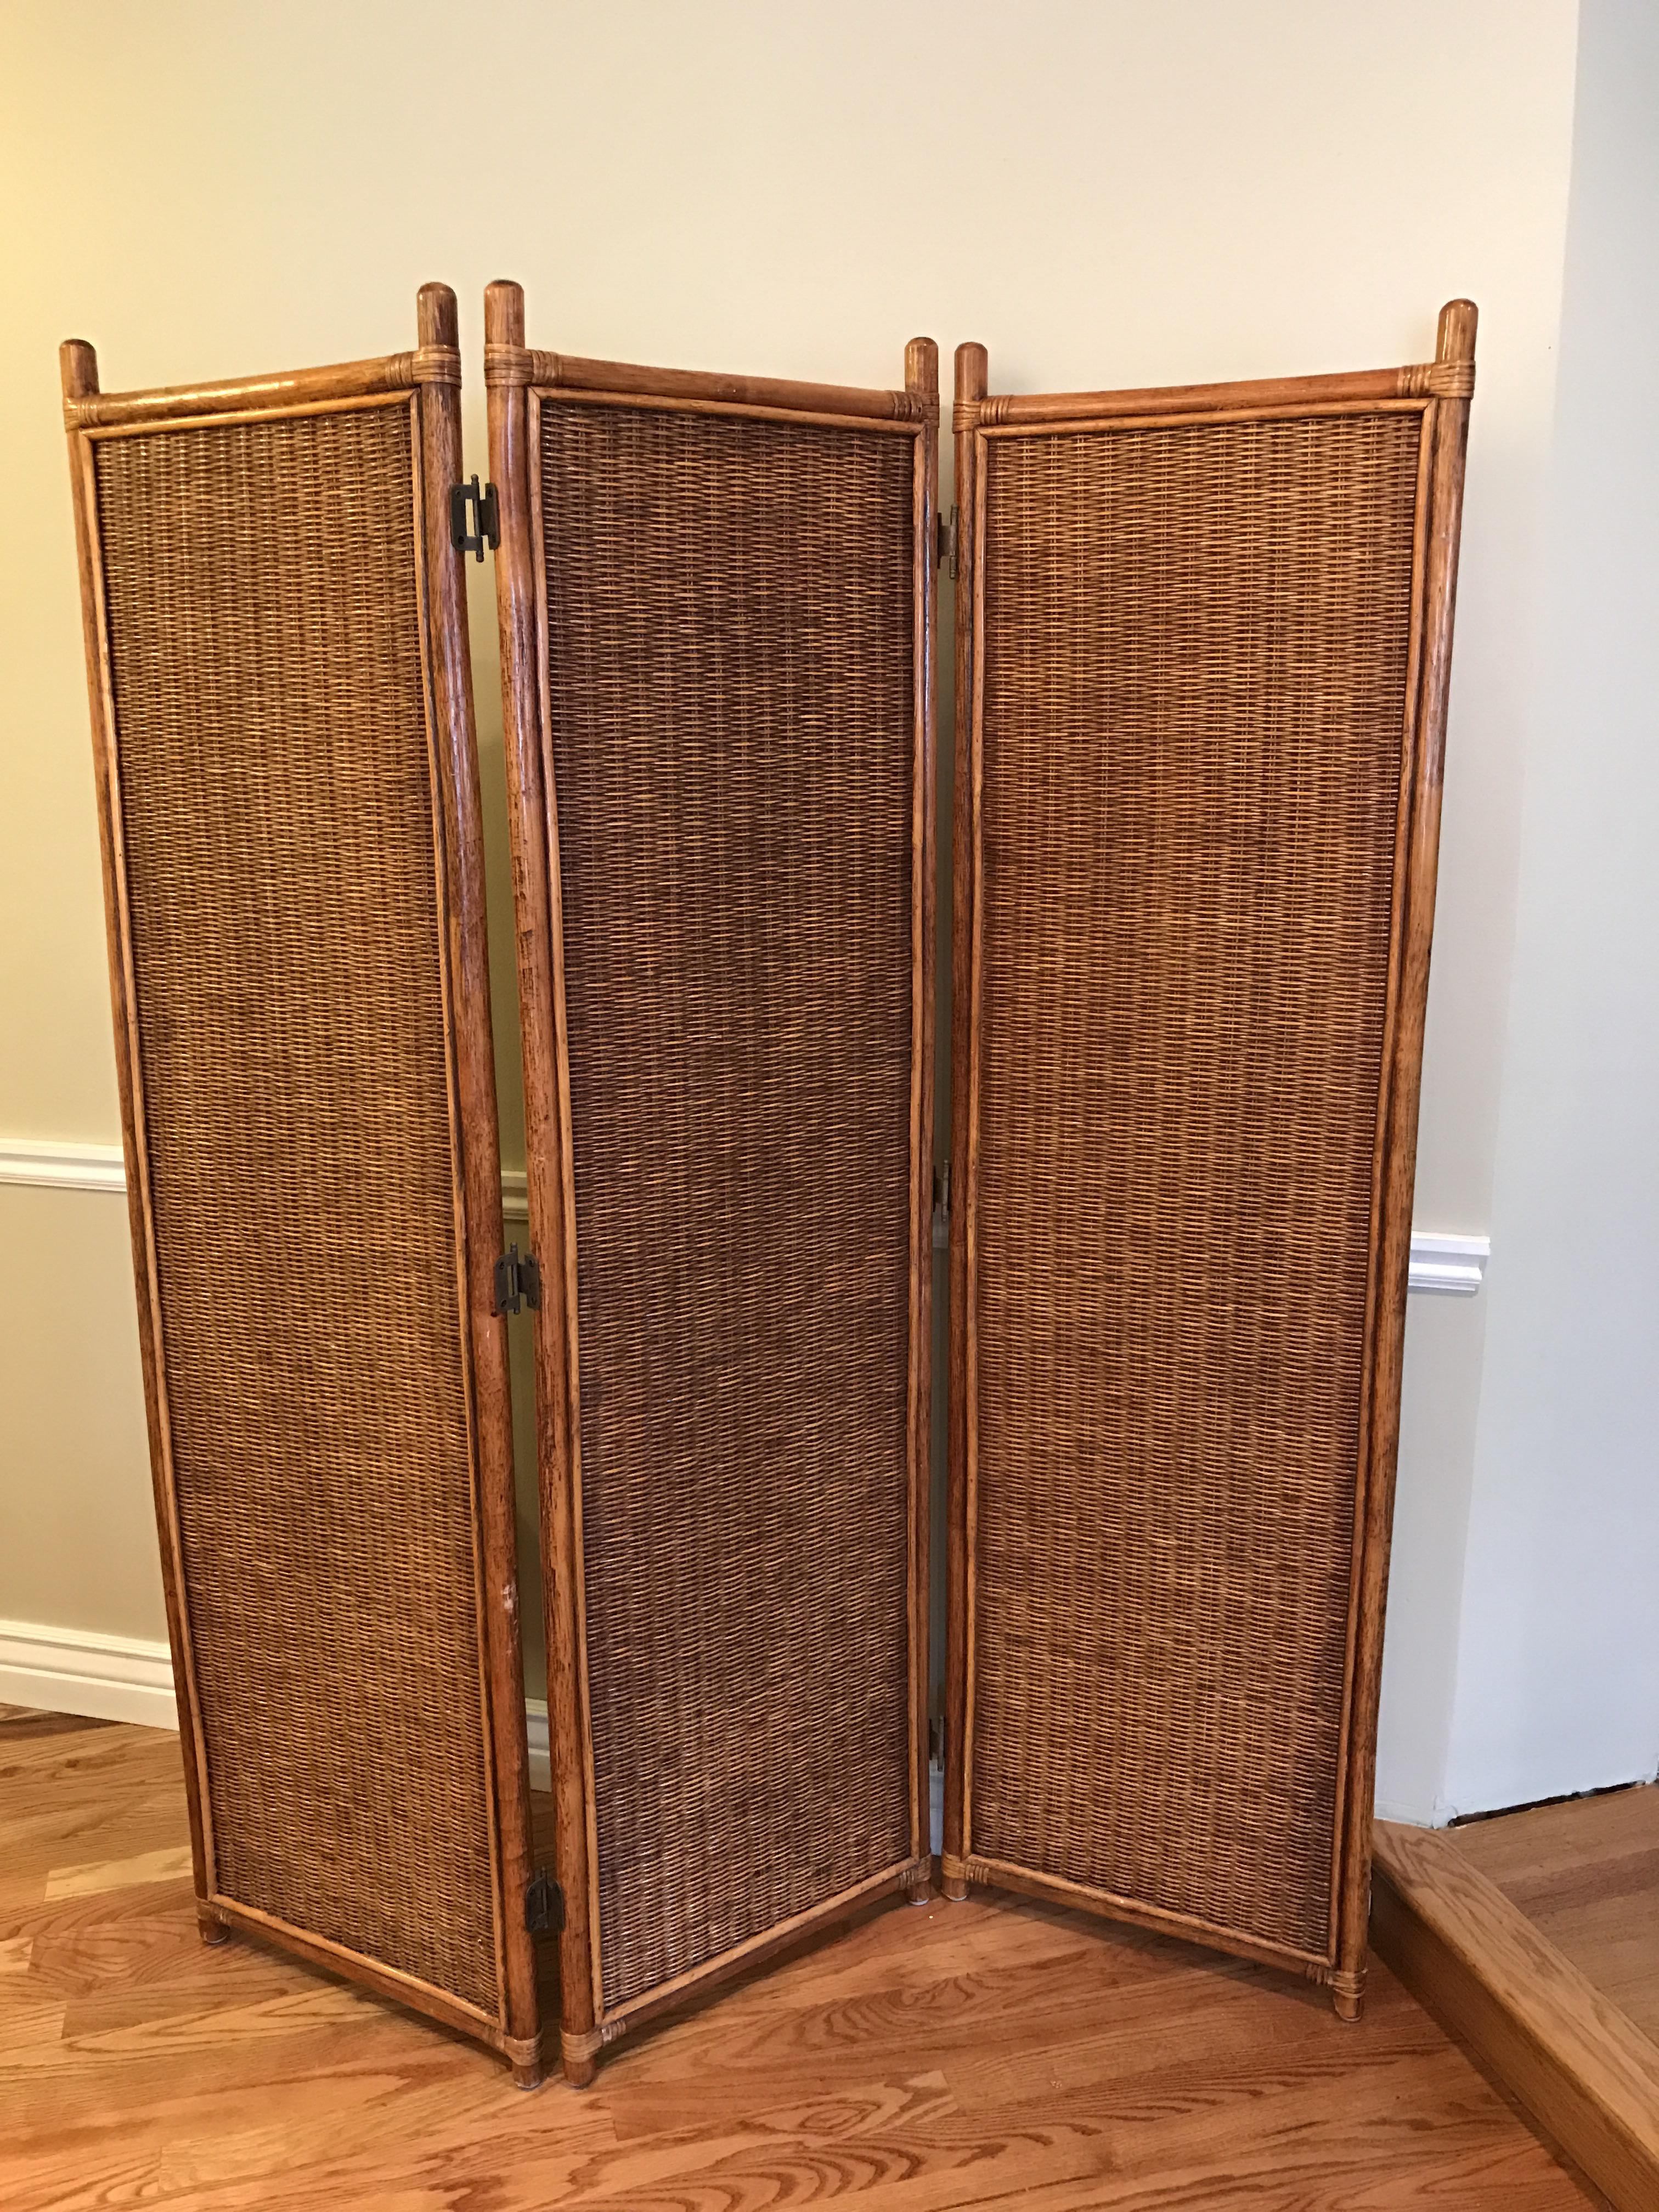 Vintage Rattan Room Divider Chairish